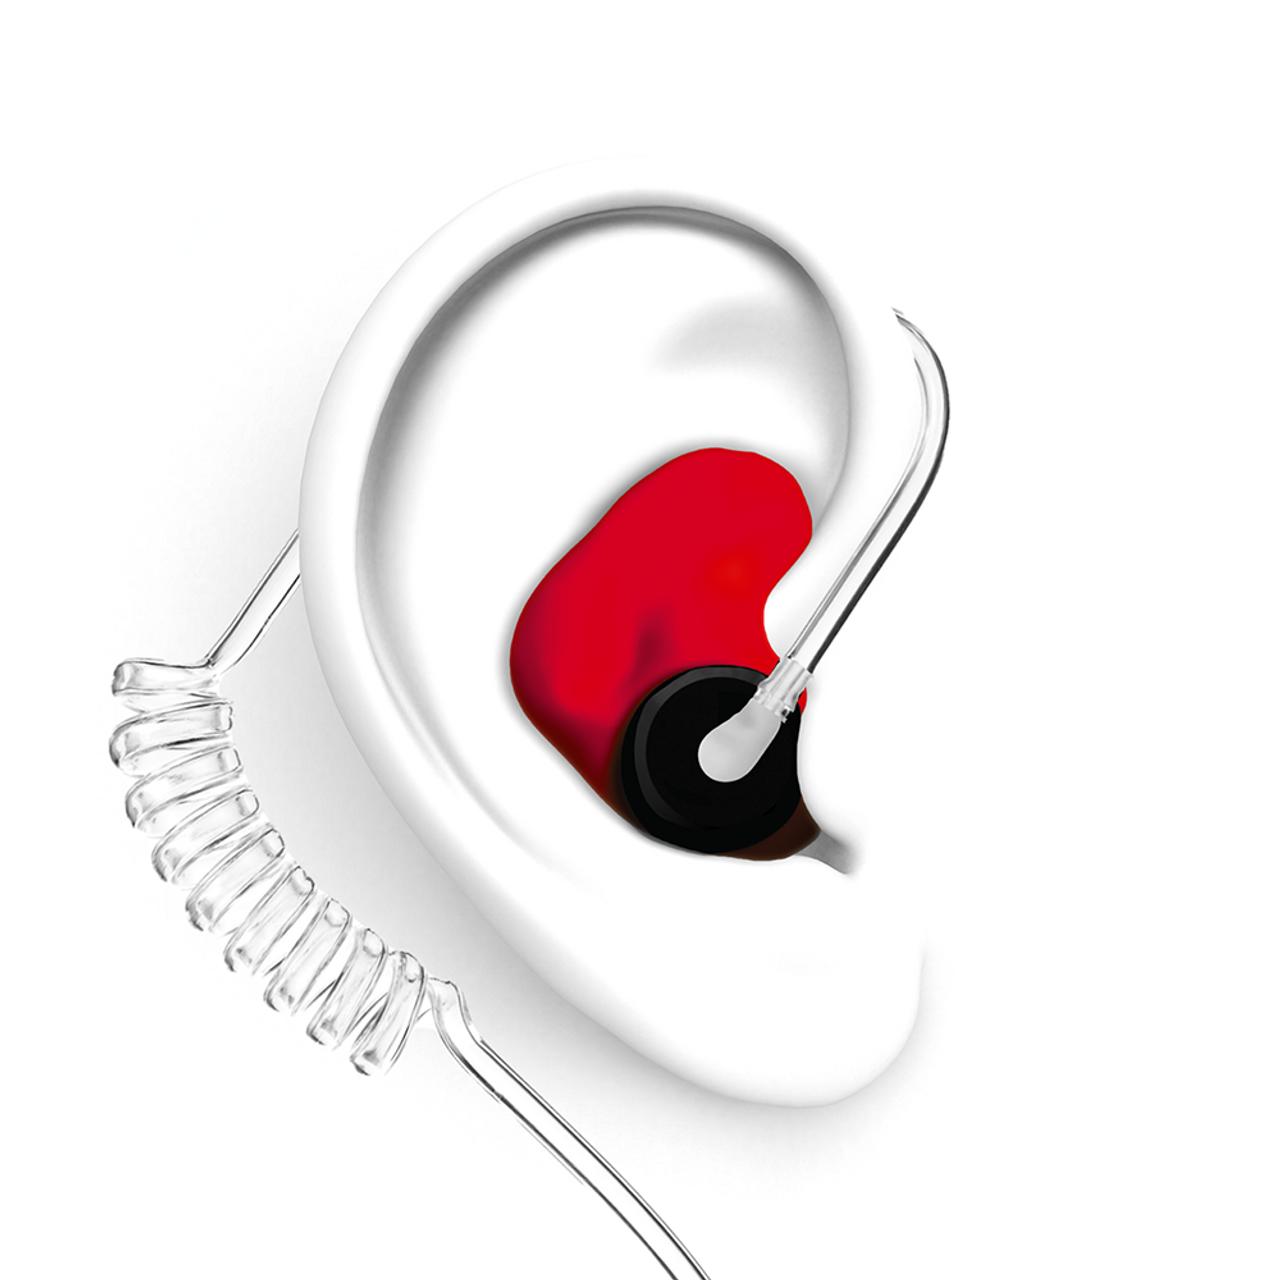 DECIBULLZ Red Custom Earplug for Two Way Radio Headsets